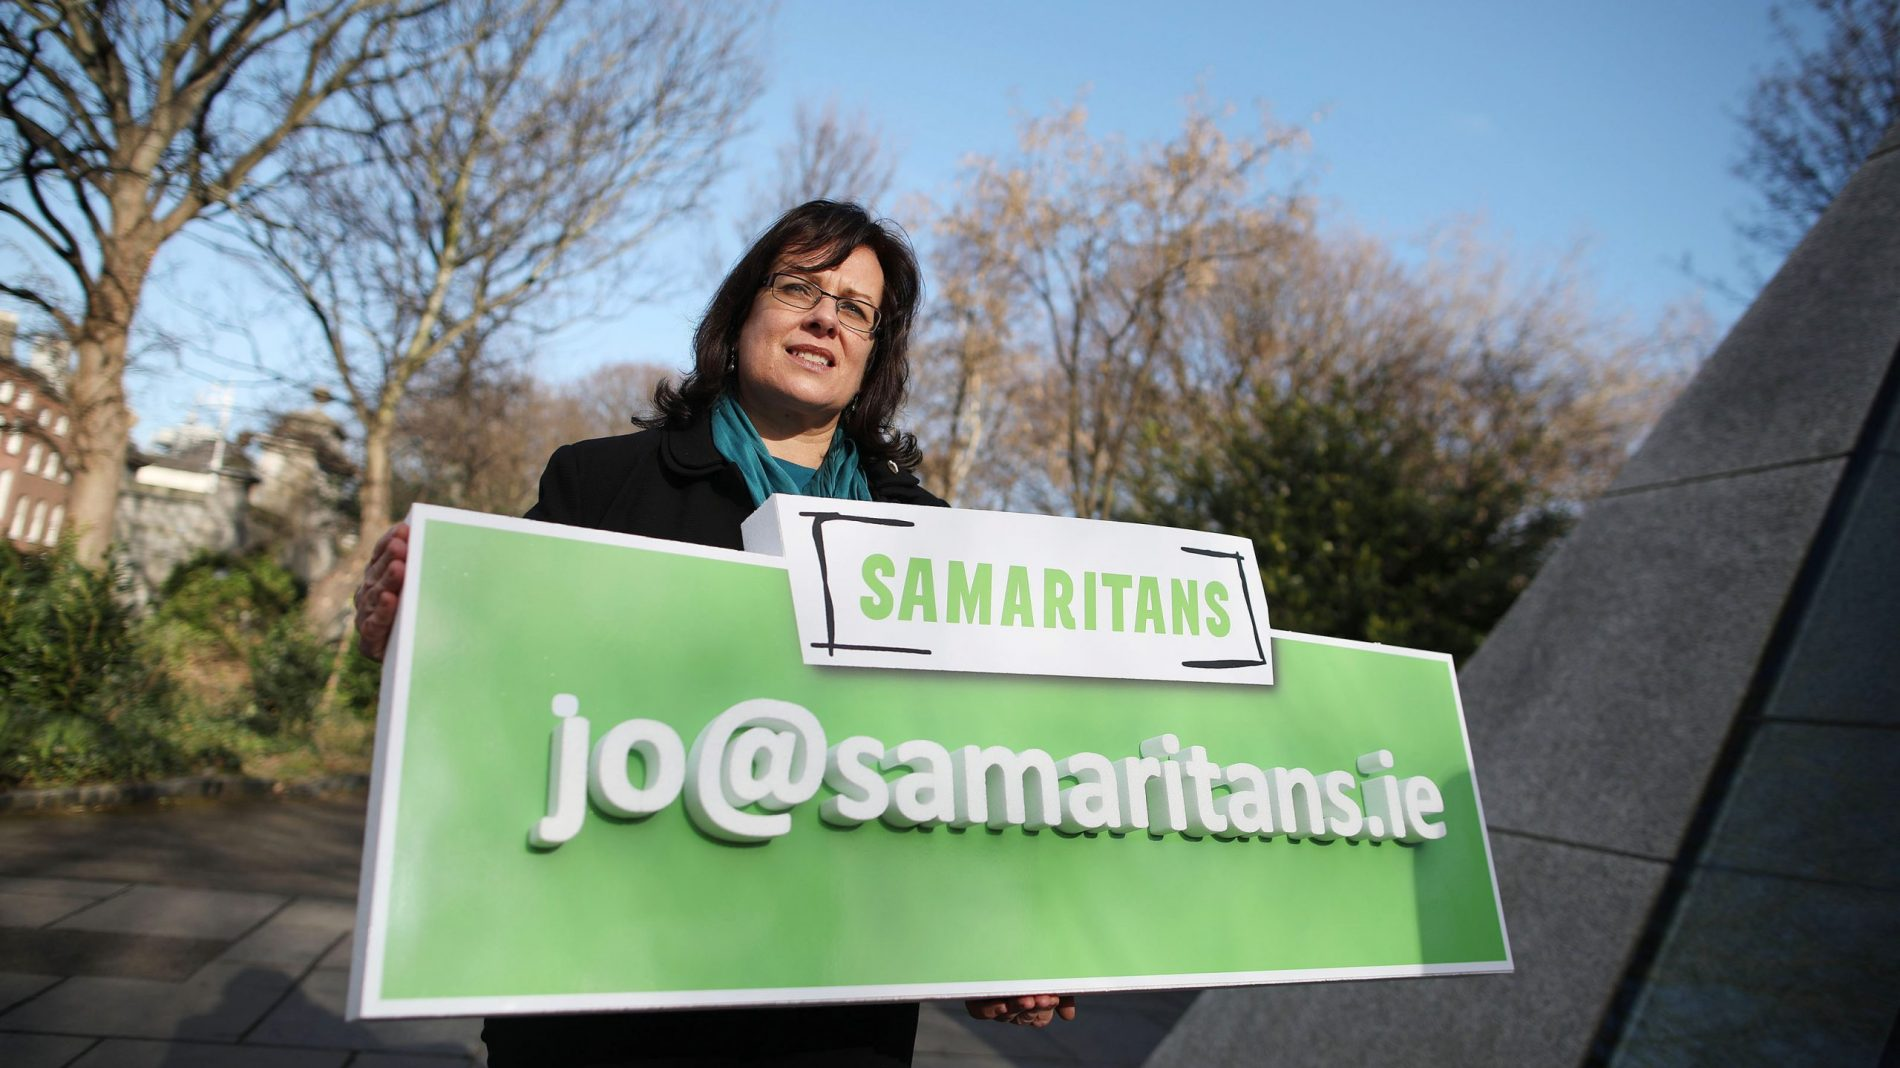 New Samaritans email address